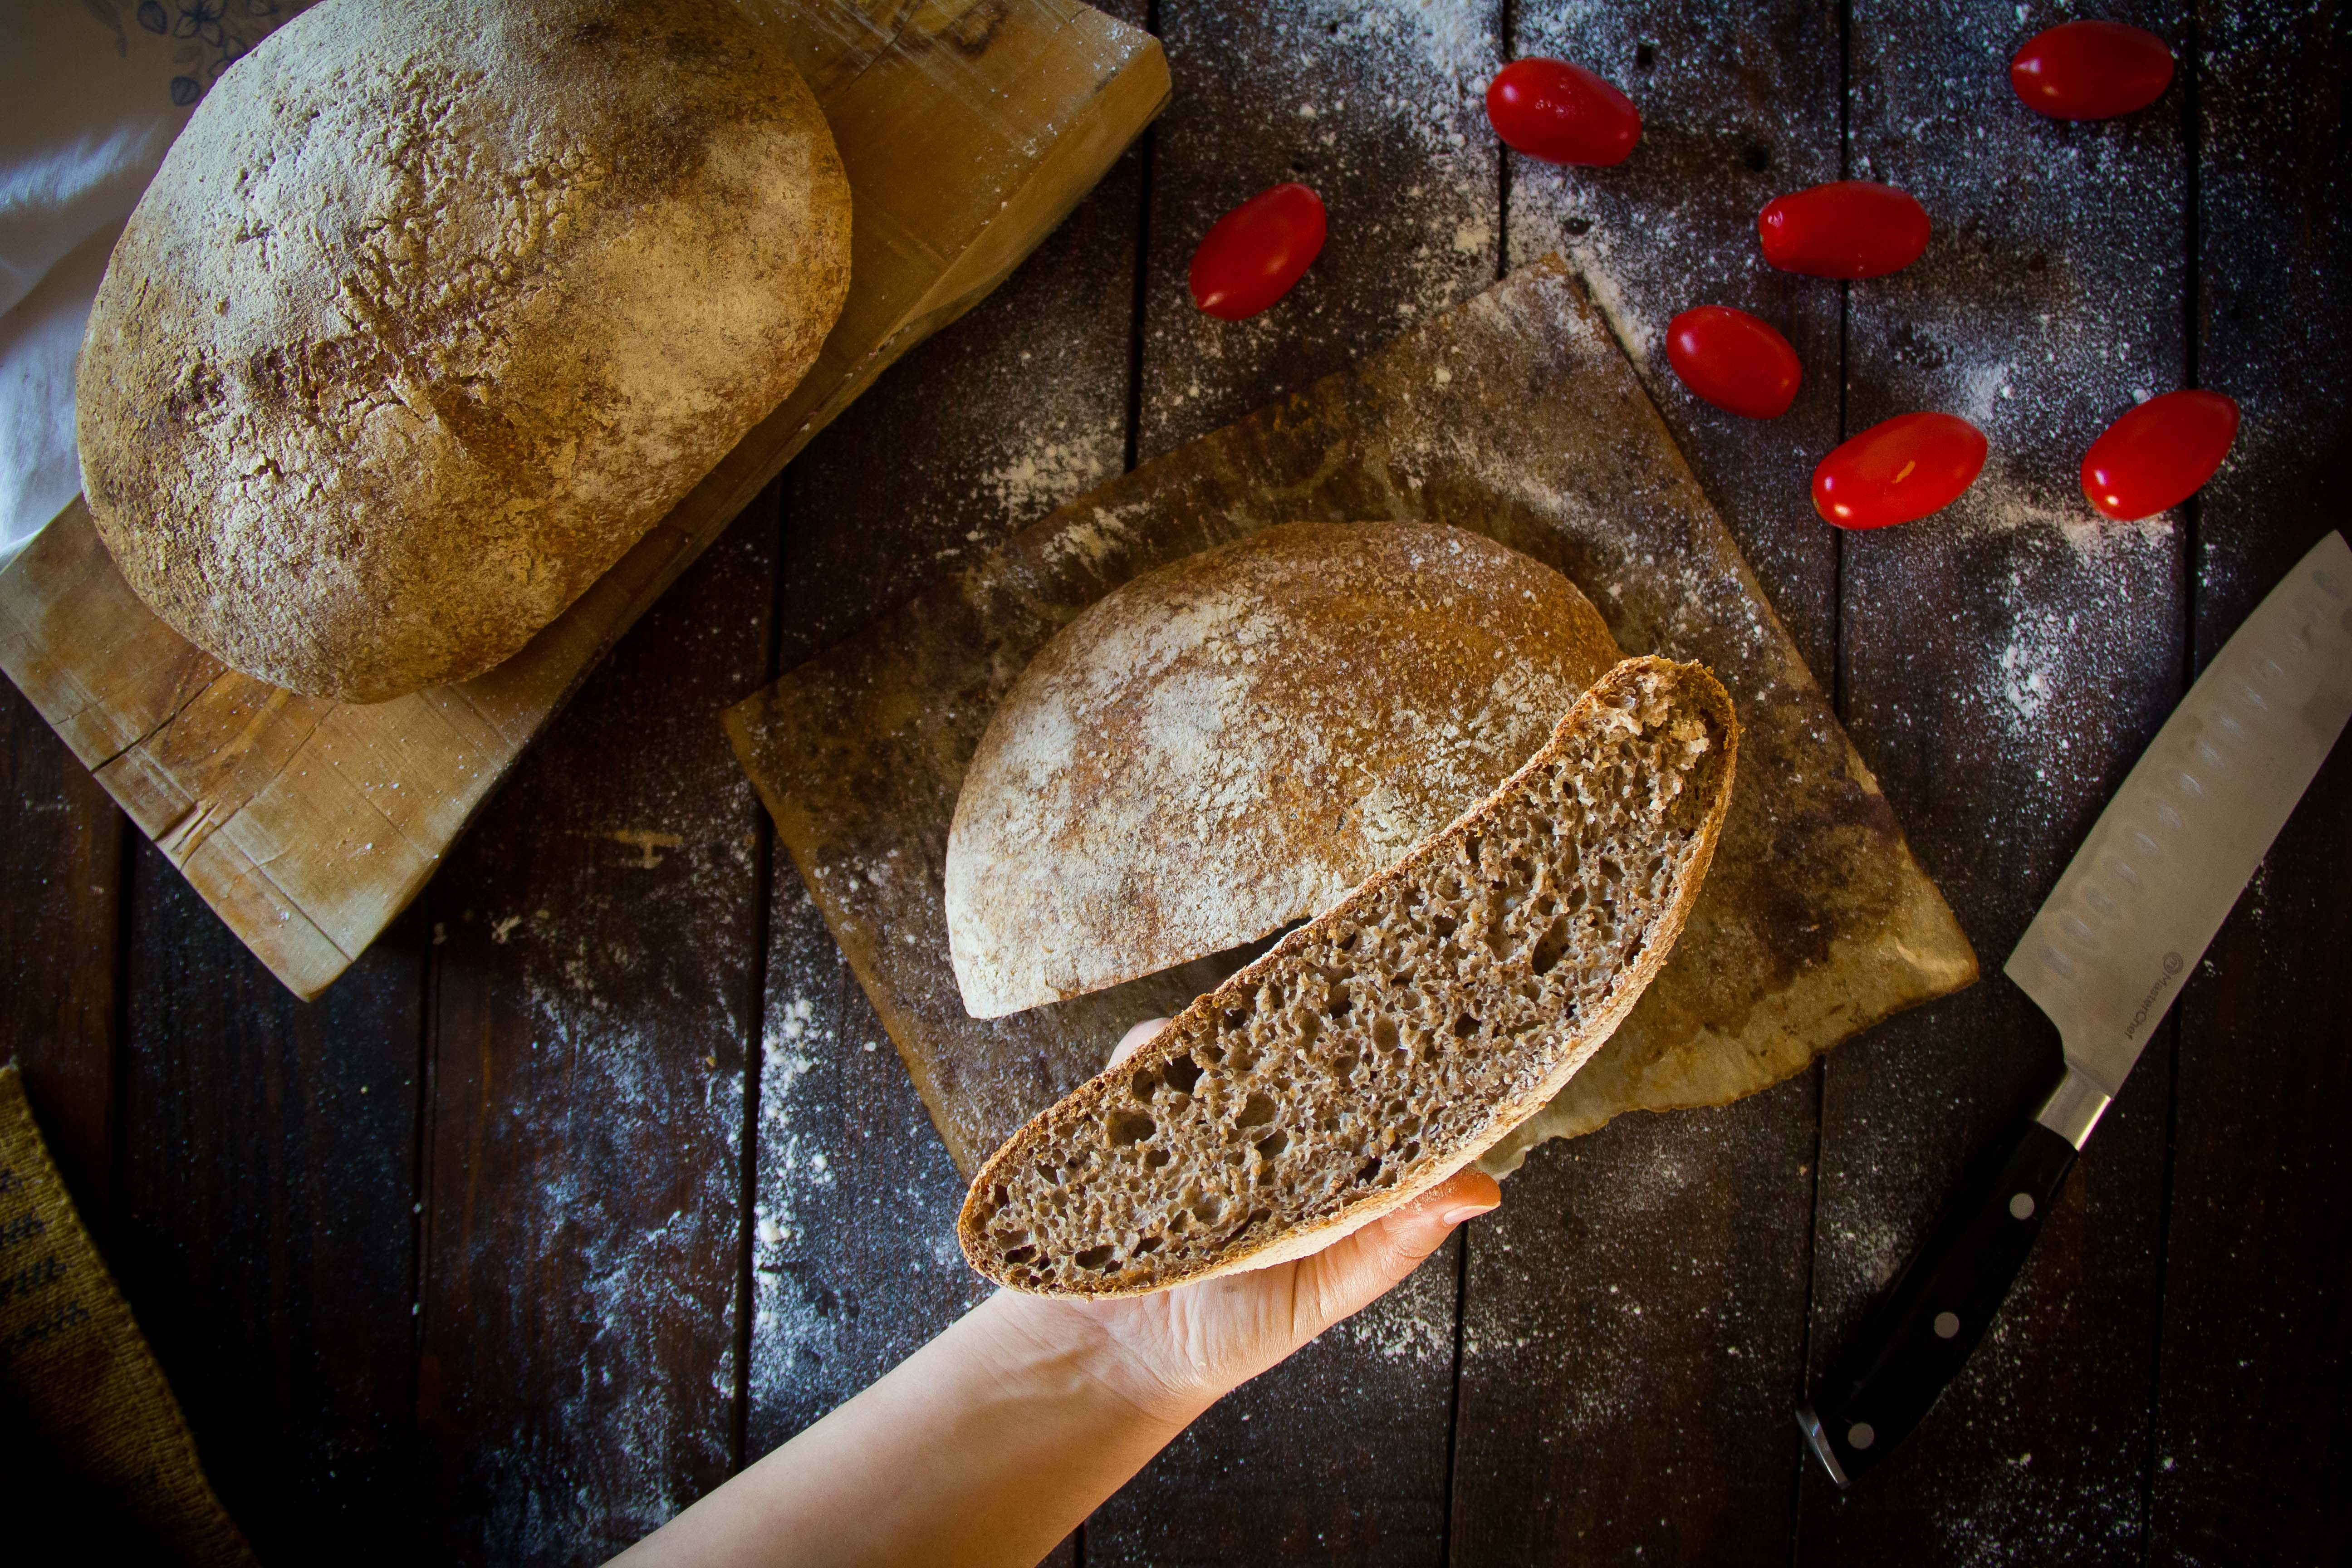 I Segreti Del Pane il pane di framentu   koendi.it